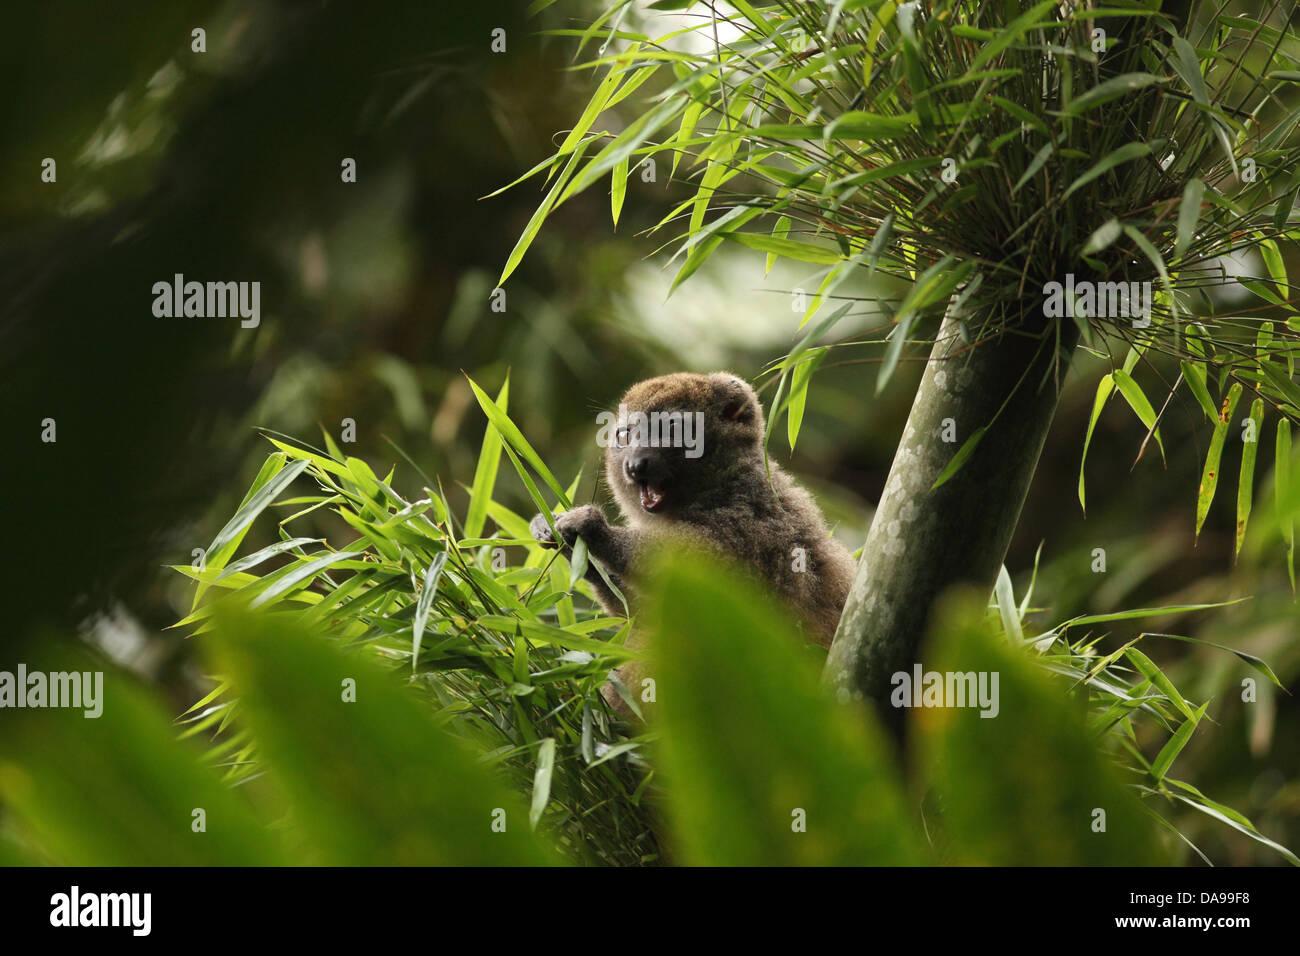 animal, mammal, lemur, Western gentle lemur, Sambirano lesser bamboo lemur, Western lesser bamboo lemur, Western - Stock Image